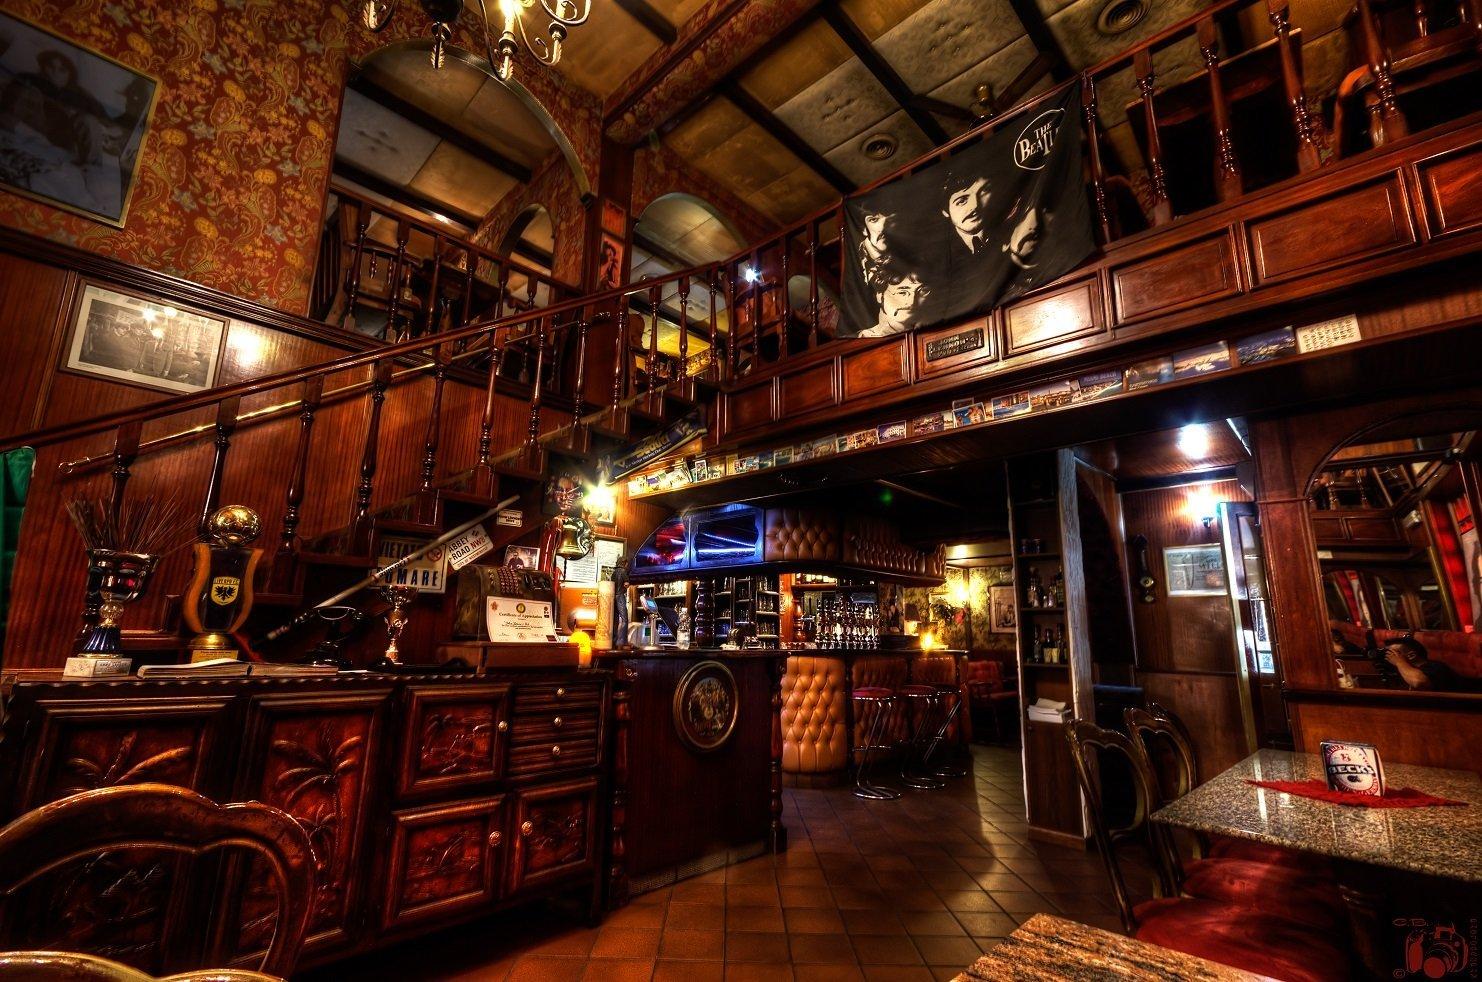 Birre artigianali torino john lennon pub for Arredamento pub inglese